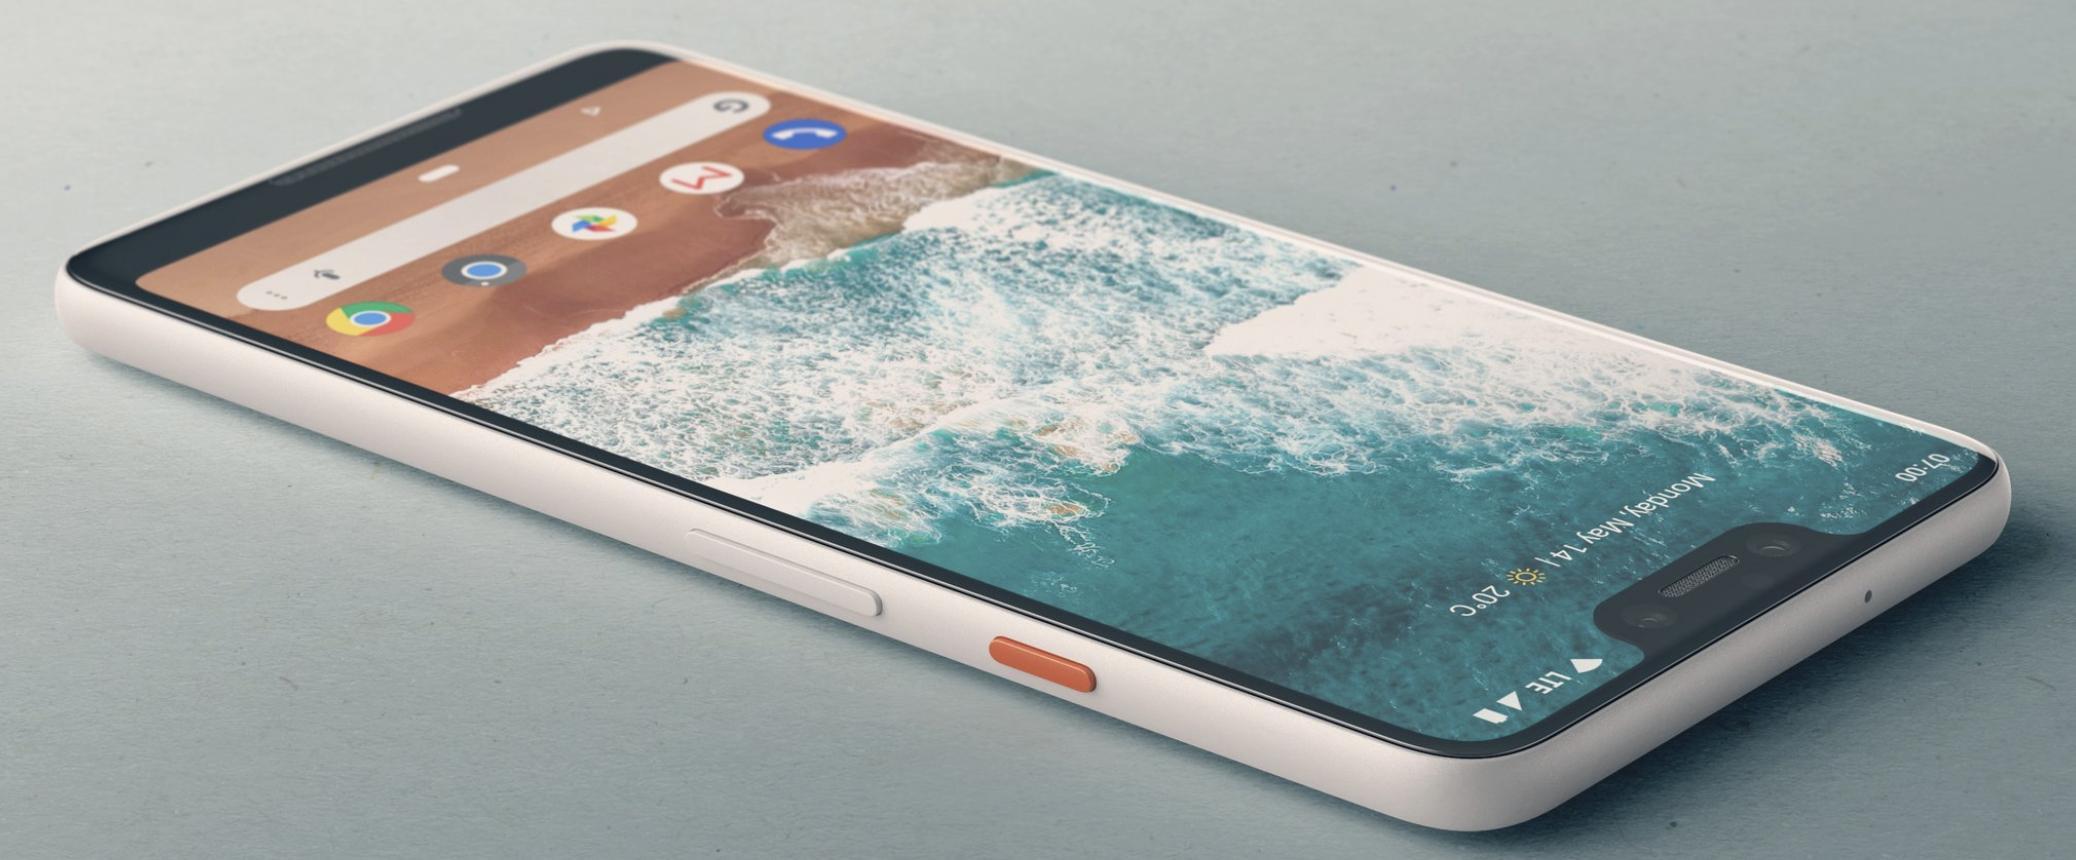 Google Pixel 3: If it looks like this, sign me up - SlashGear